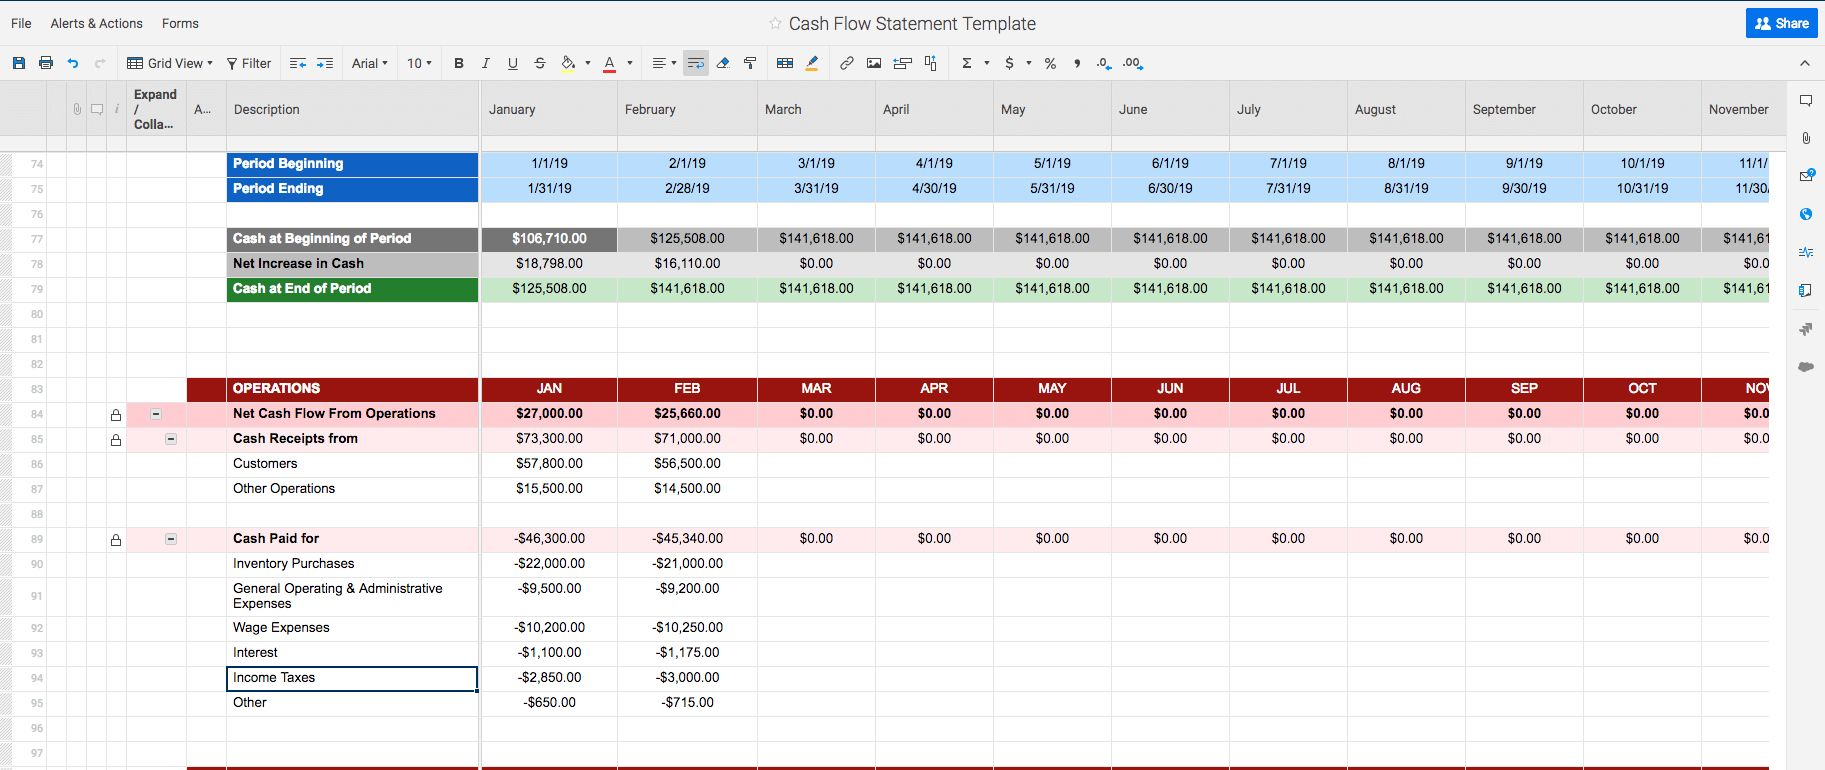 Free Cash Flow Statement Templates Smartsheet Throughout